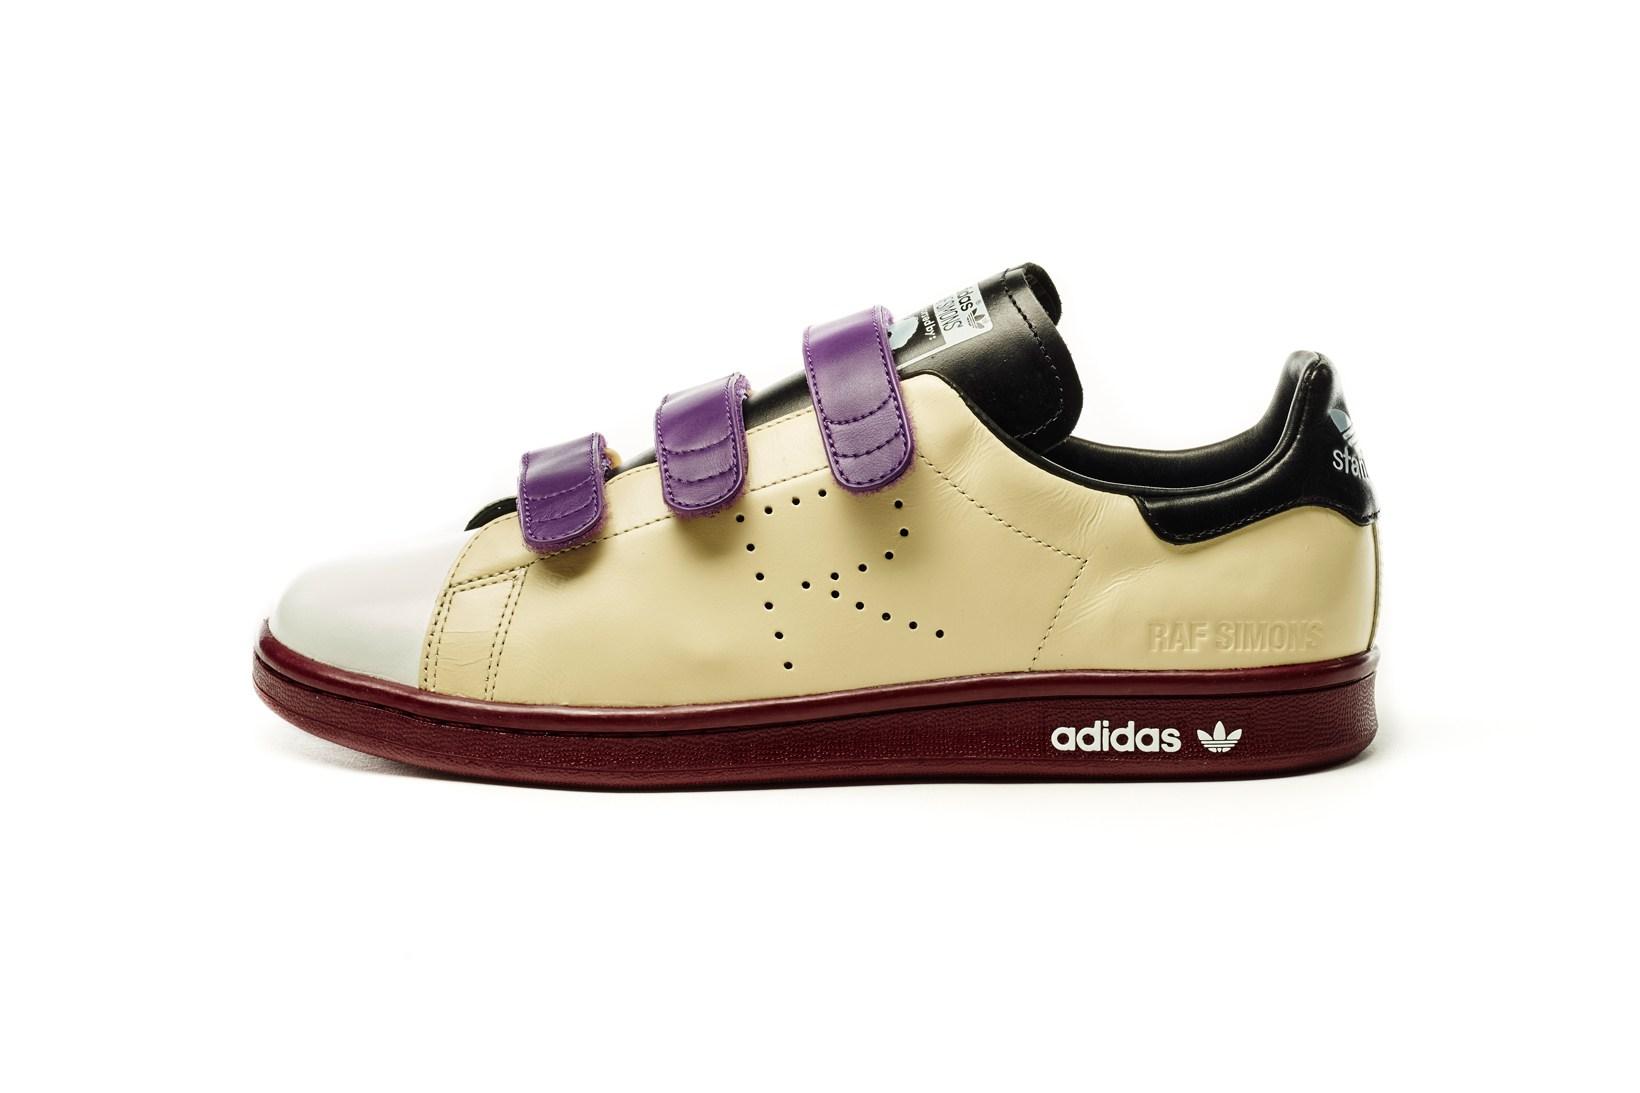 Adidas x Raf Simons Fall/Winter 2016 Footwear Collection